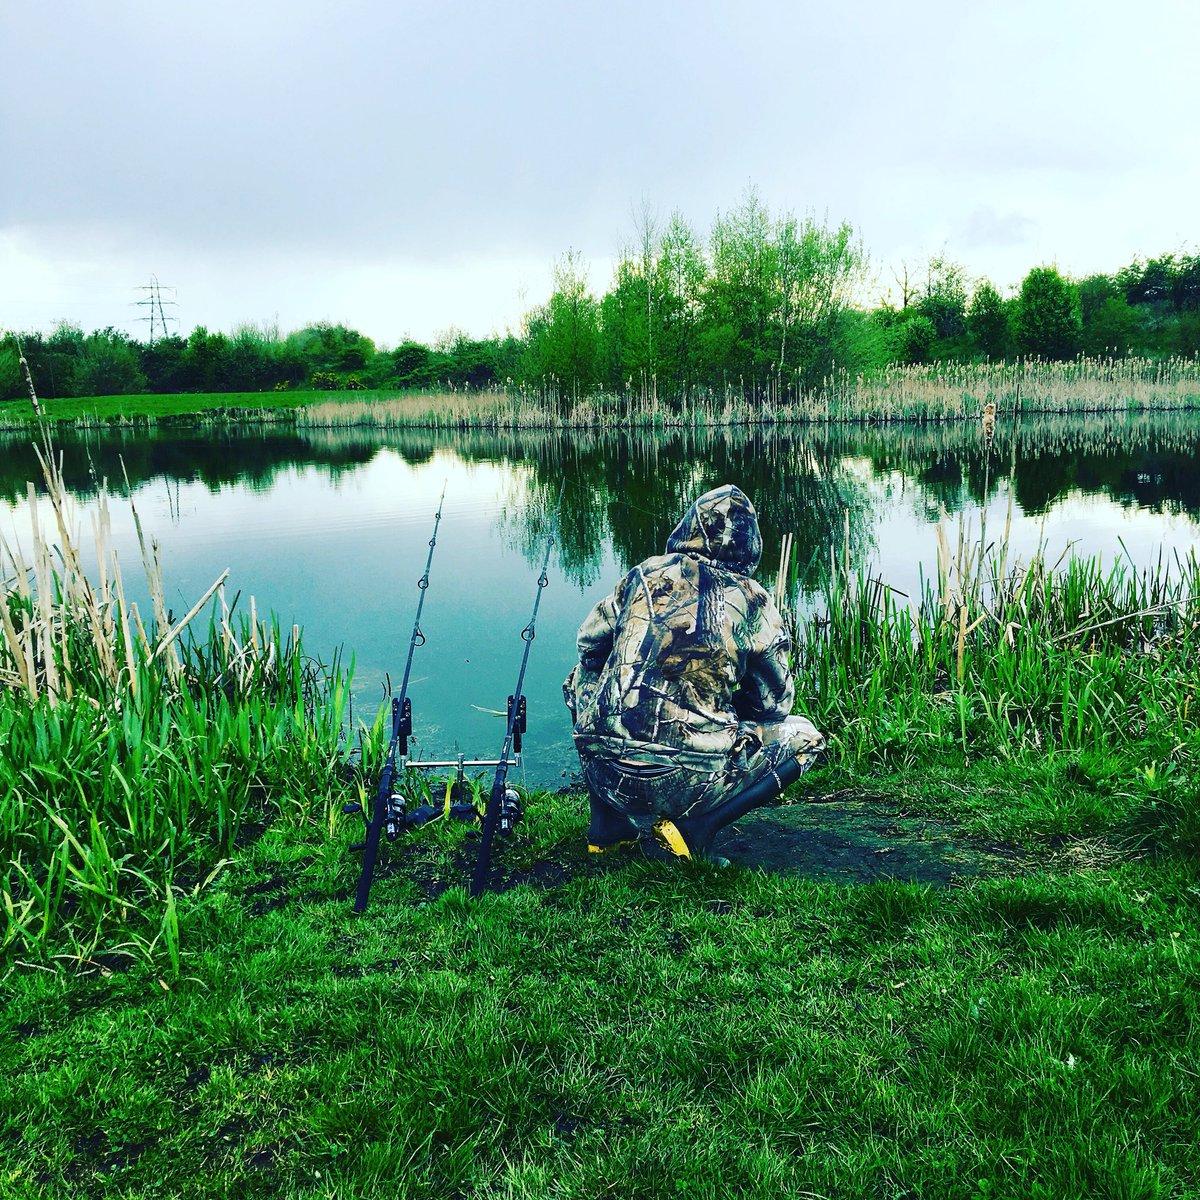 Few <b>Hour</b>s Fishing with the boy🎣#dadandladtime #carpfishing https://t.co/df4M05TGT4